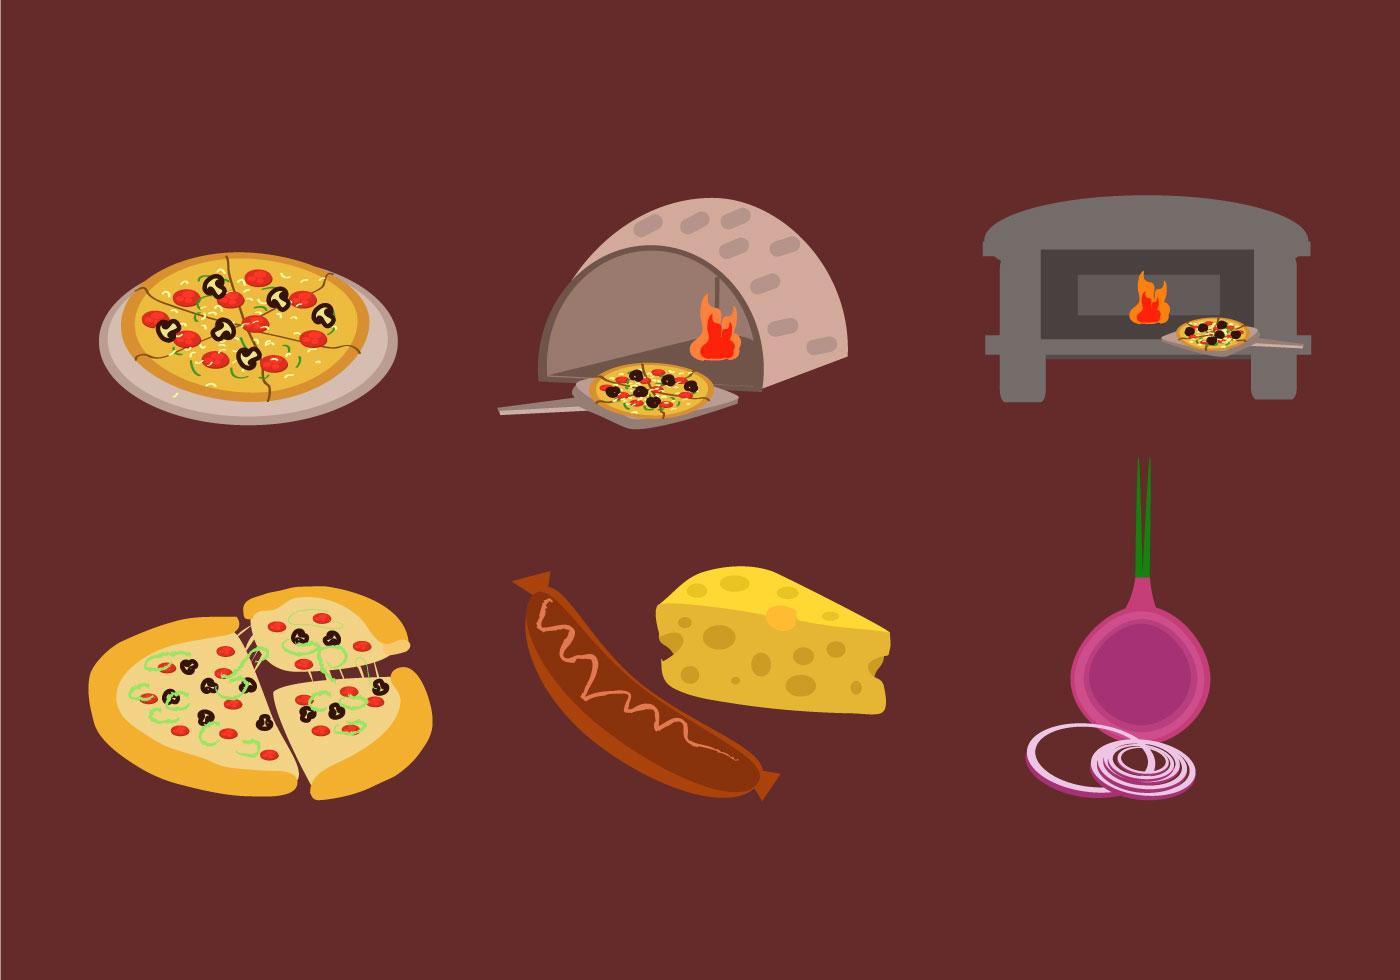 Making Pizza Vector - Download Free Vector Art, Stock ...